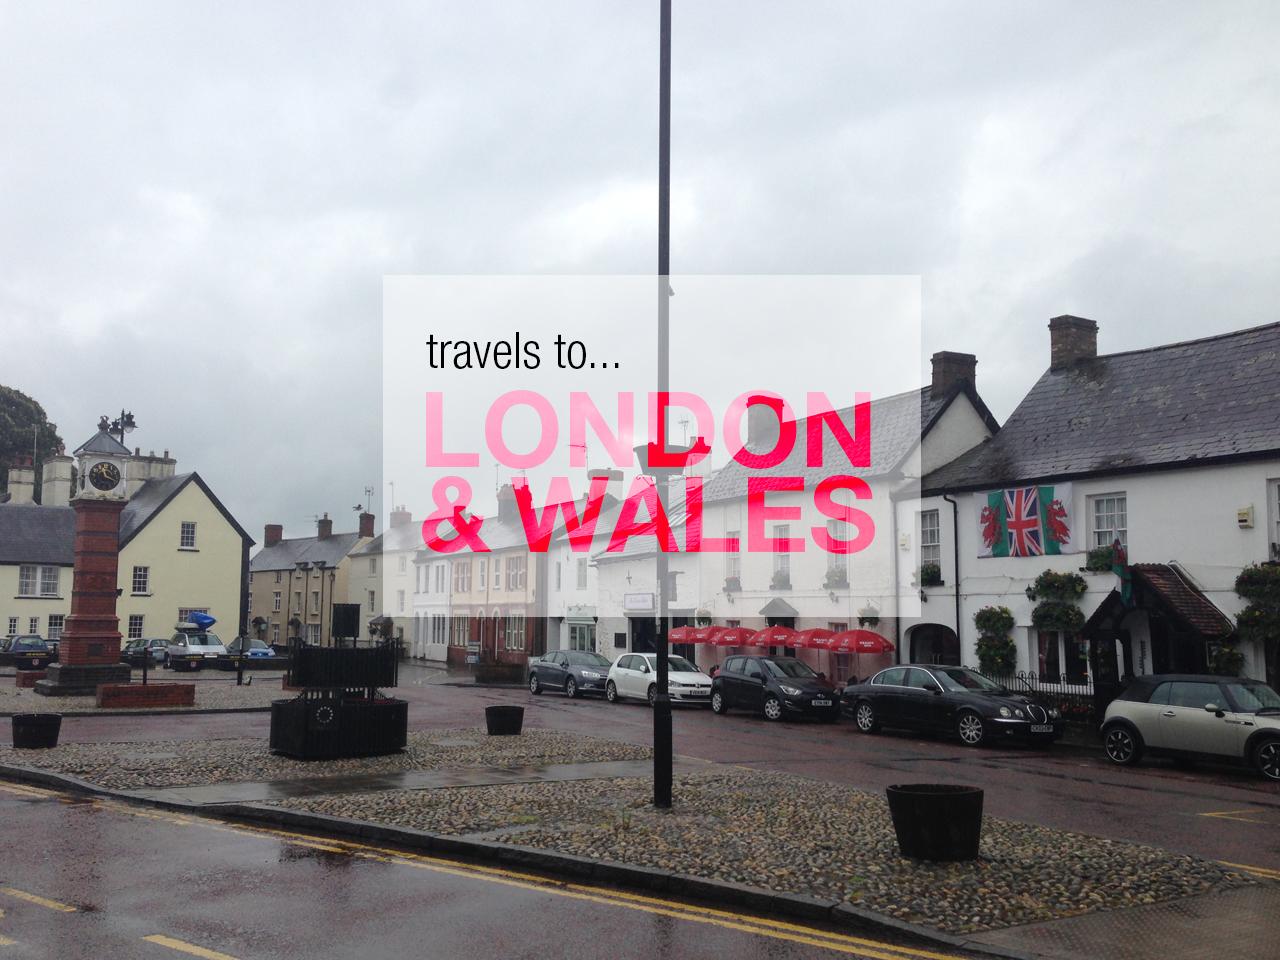 onto my next stop- Newport Wales!